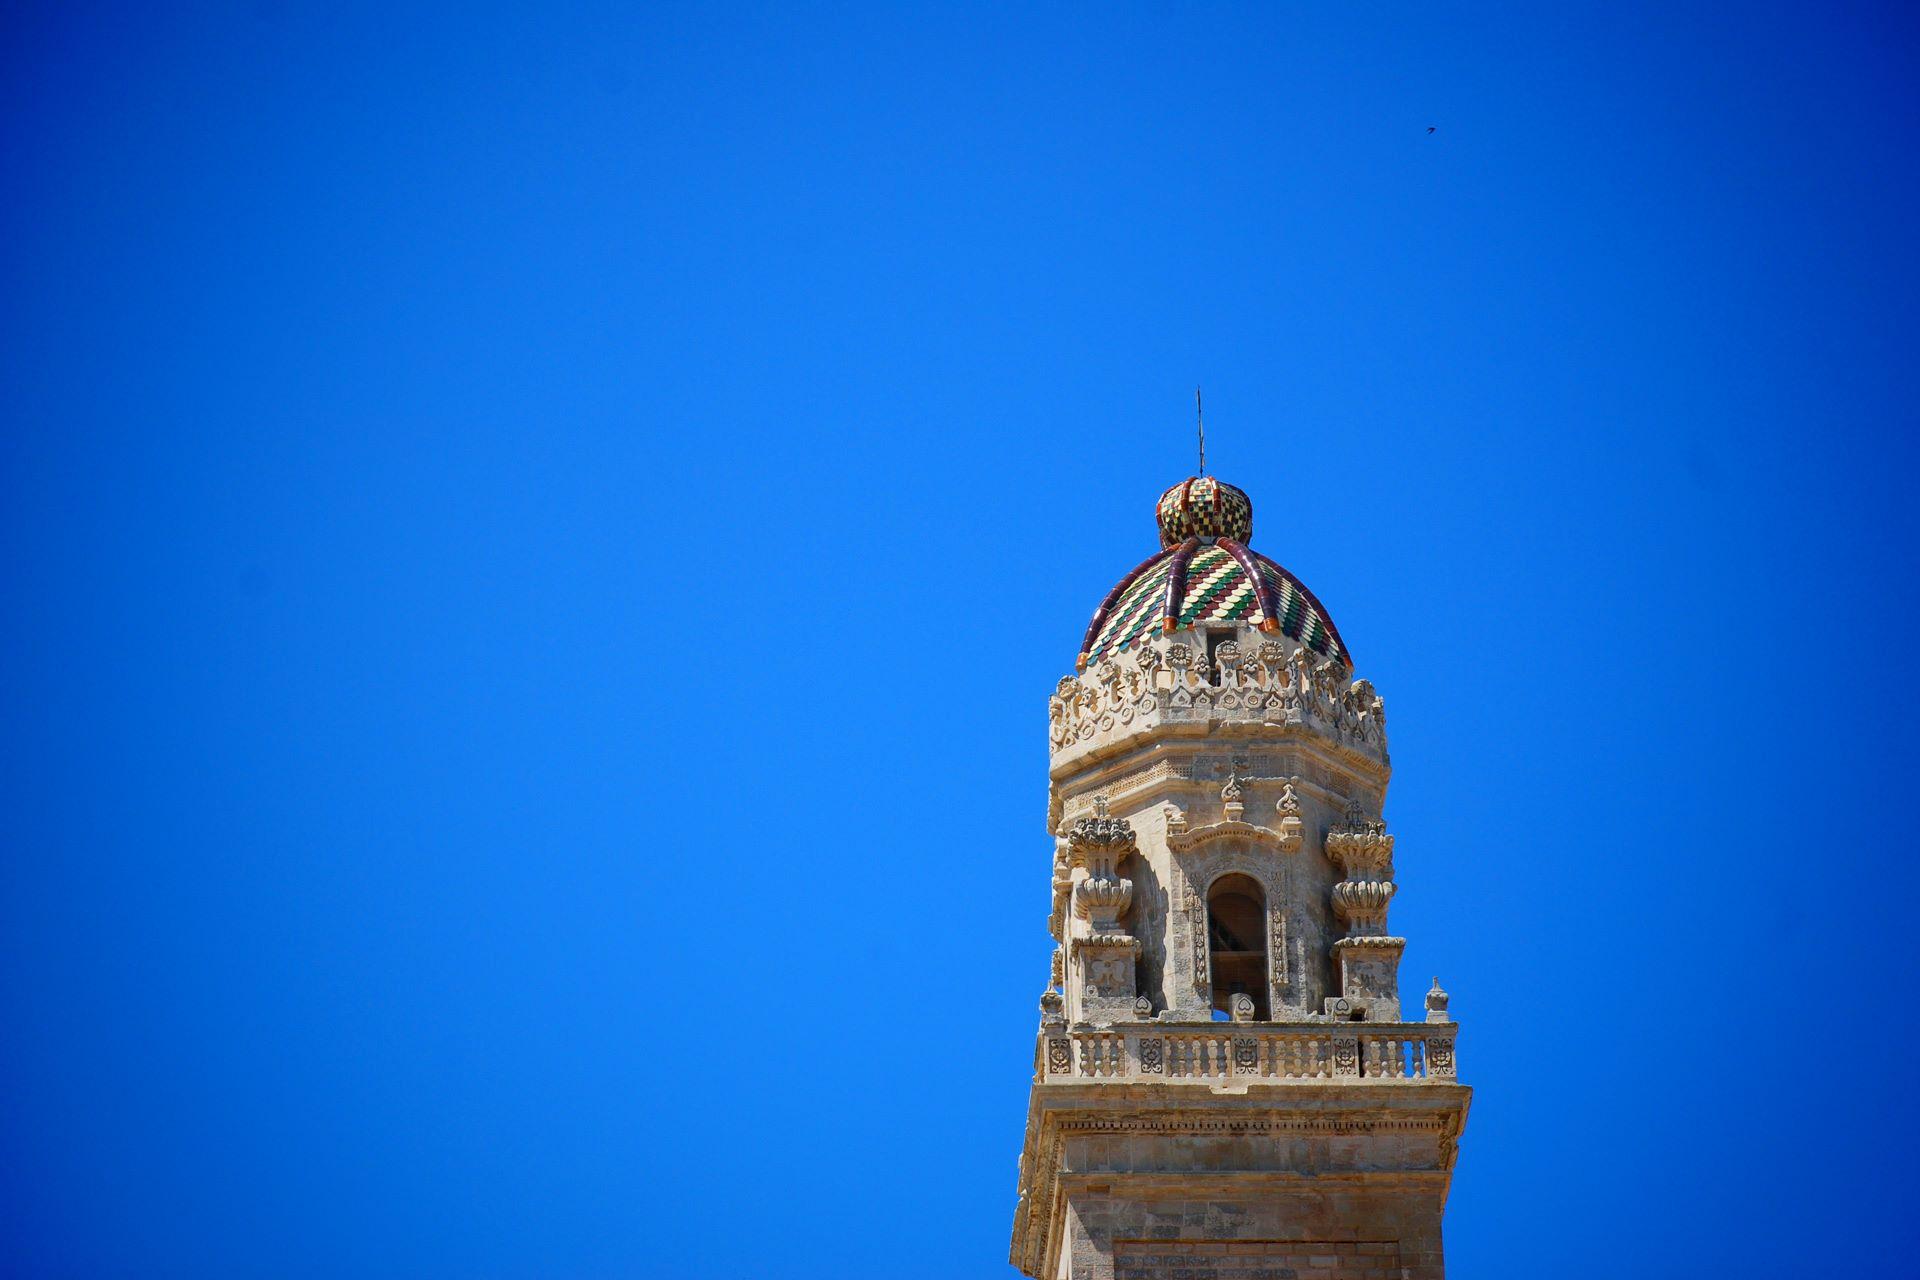 apulia-slow-travel-lecce-campanile duomo-santo oronzo-barocco-dom- bell tower- glockenturm- barock-baroque